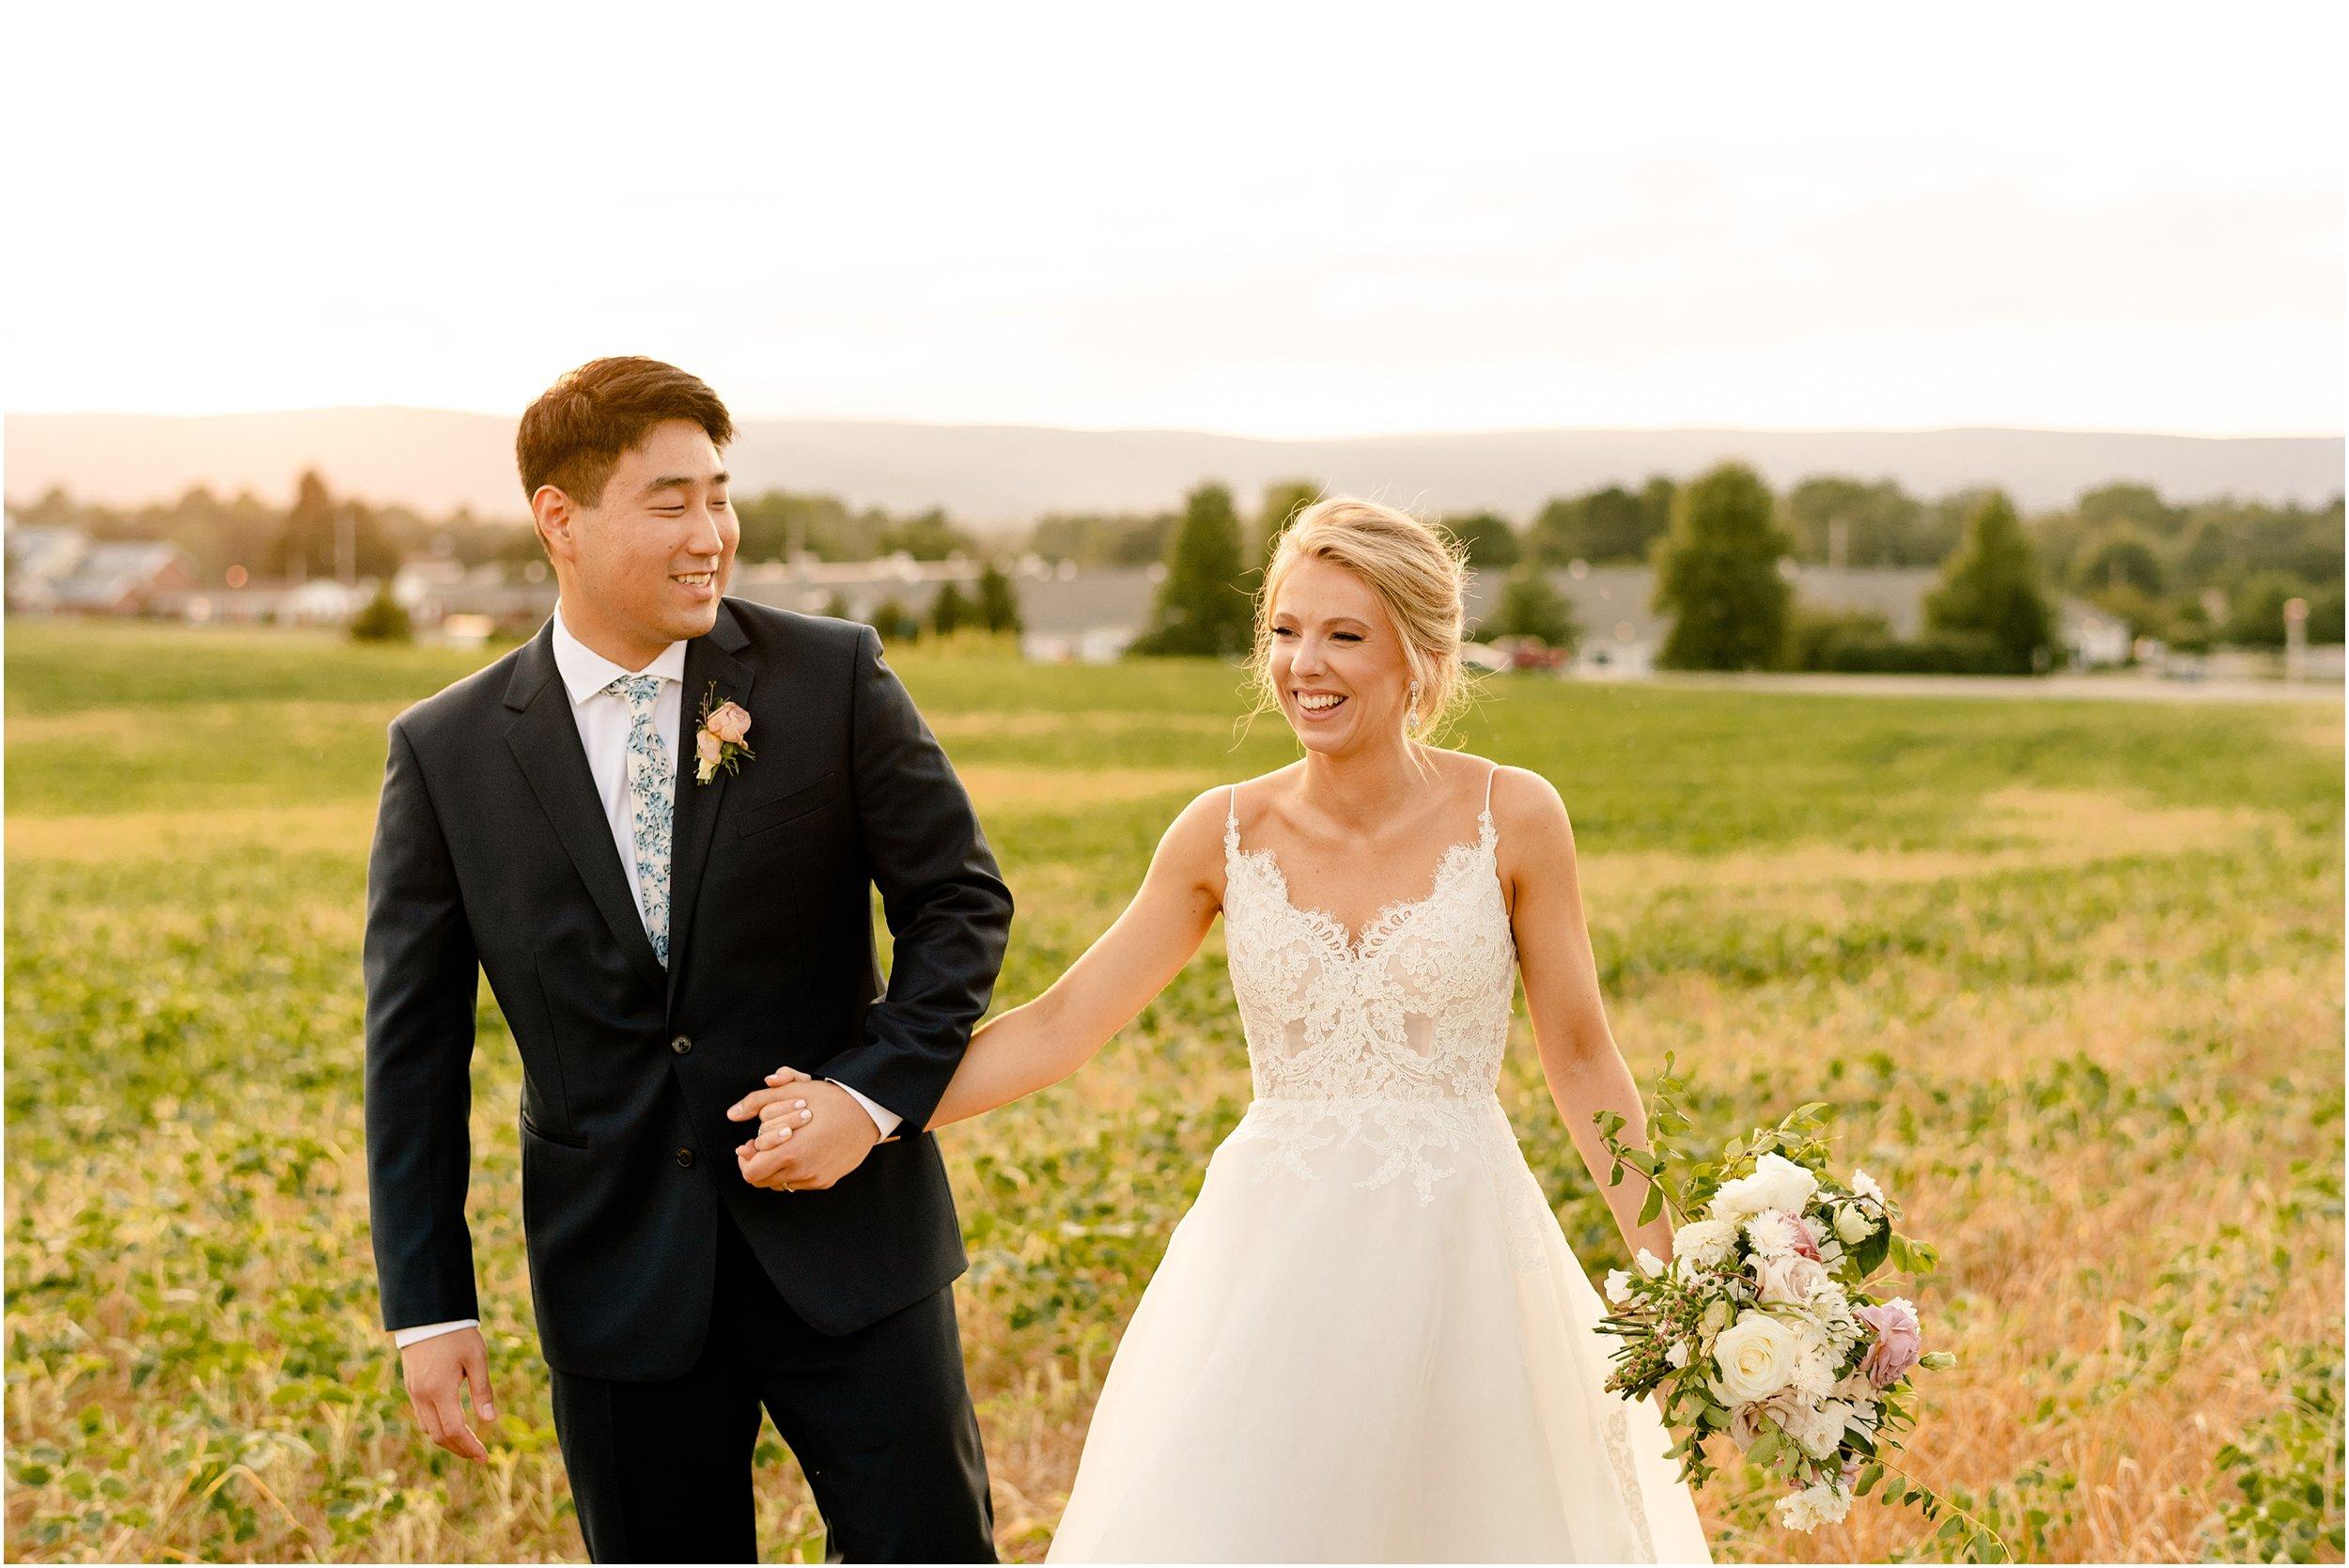 hannah leigh photography Walkers Overlook Wedding Walkersville MD_3555.jpg